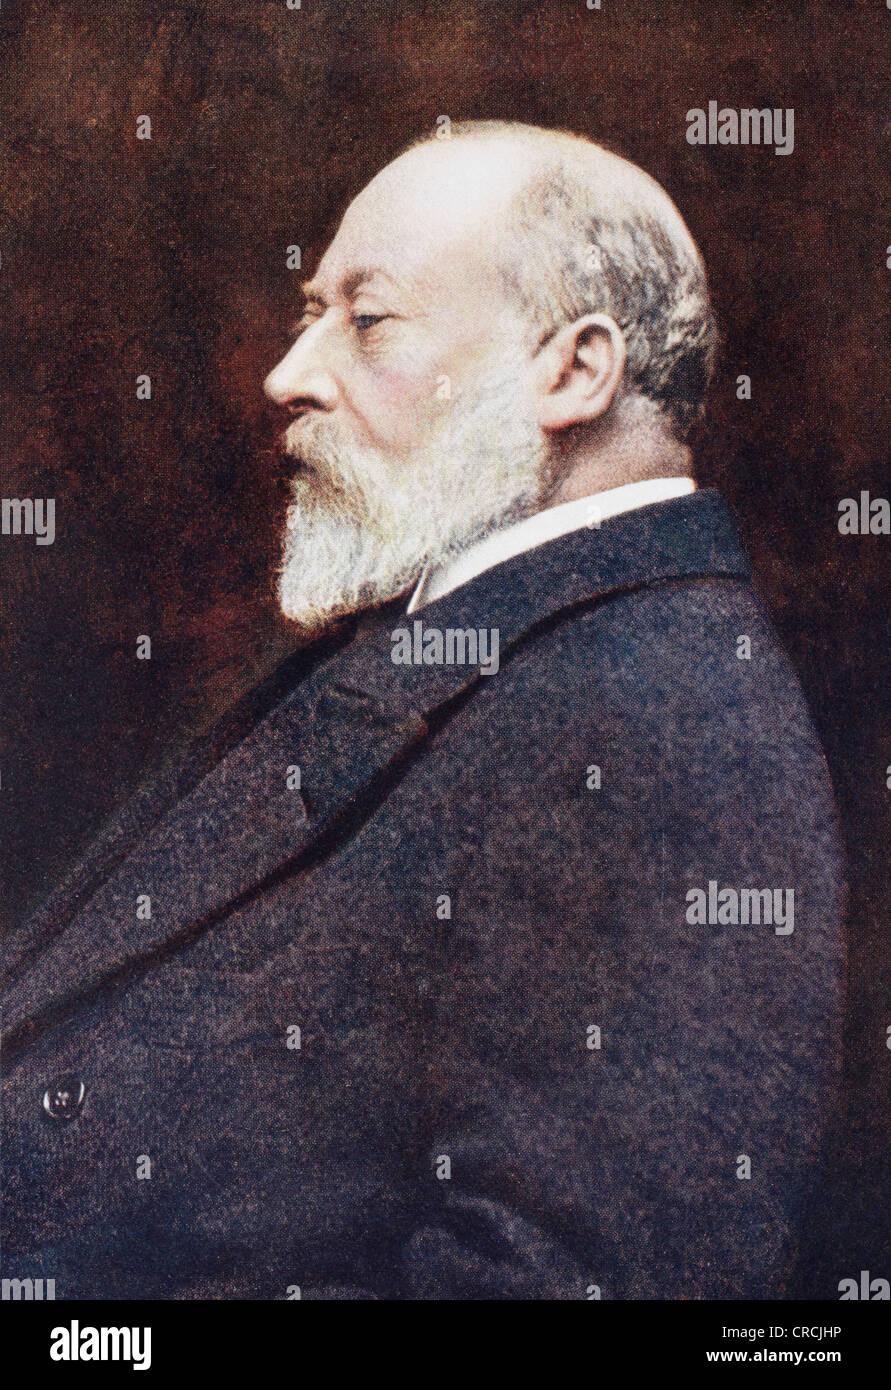 Edward VII, Albert Edward, 1841 –1910. King of the United Kingdom. From The Year 1910 Illustrated. - Stock Image